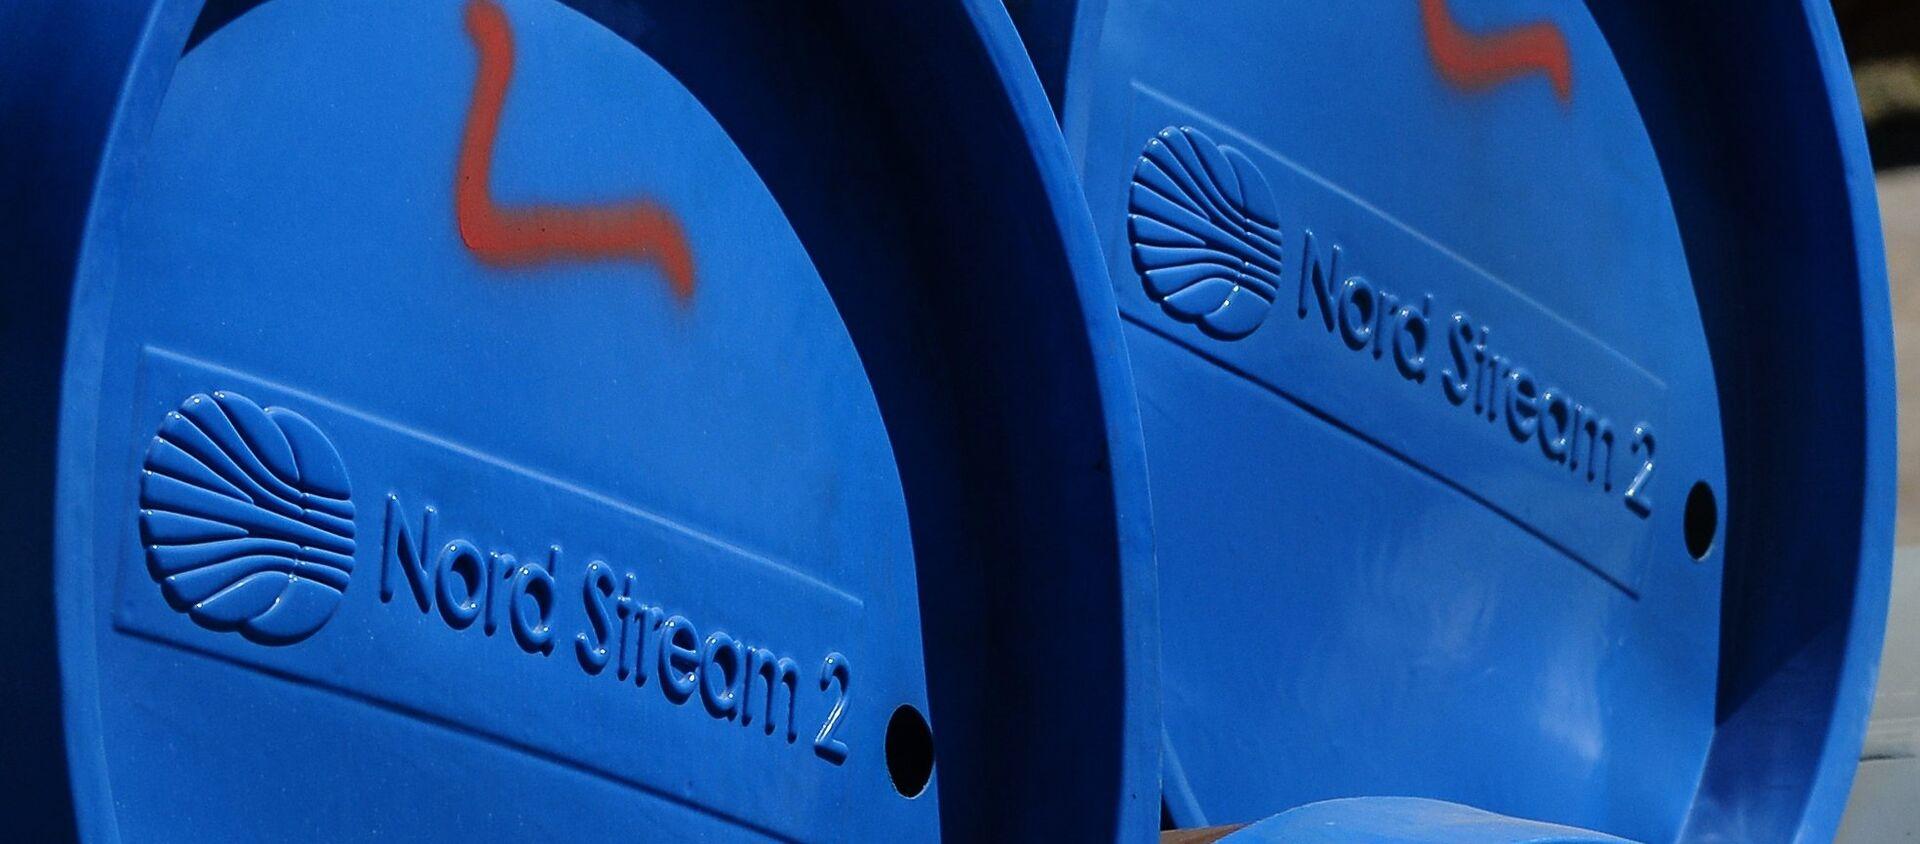 Nord Stream 2 pipes - Sputnik International, 1920, 28.07.2021